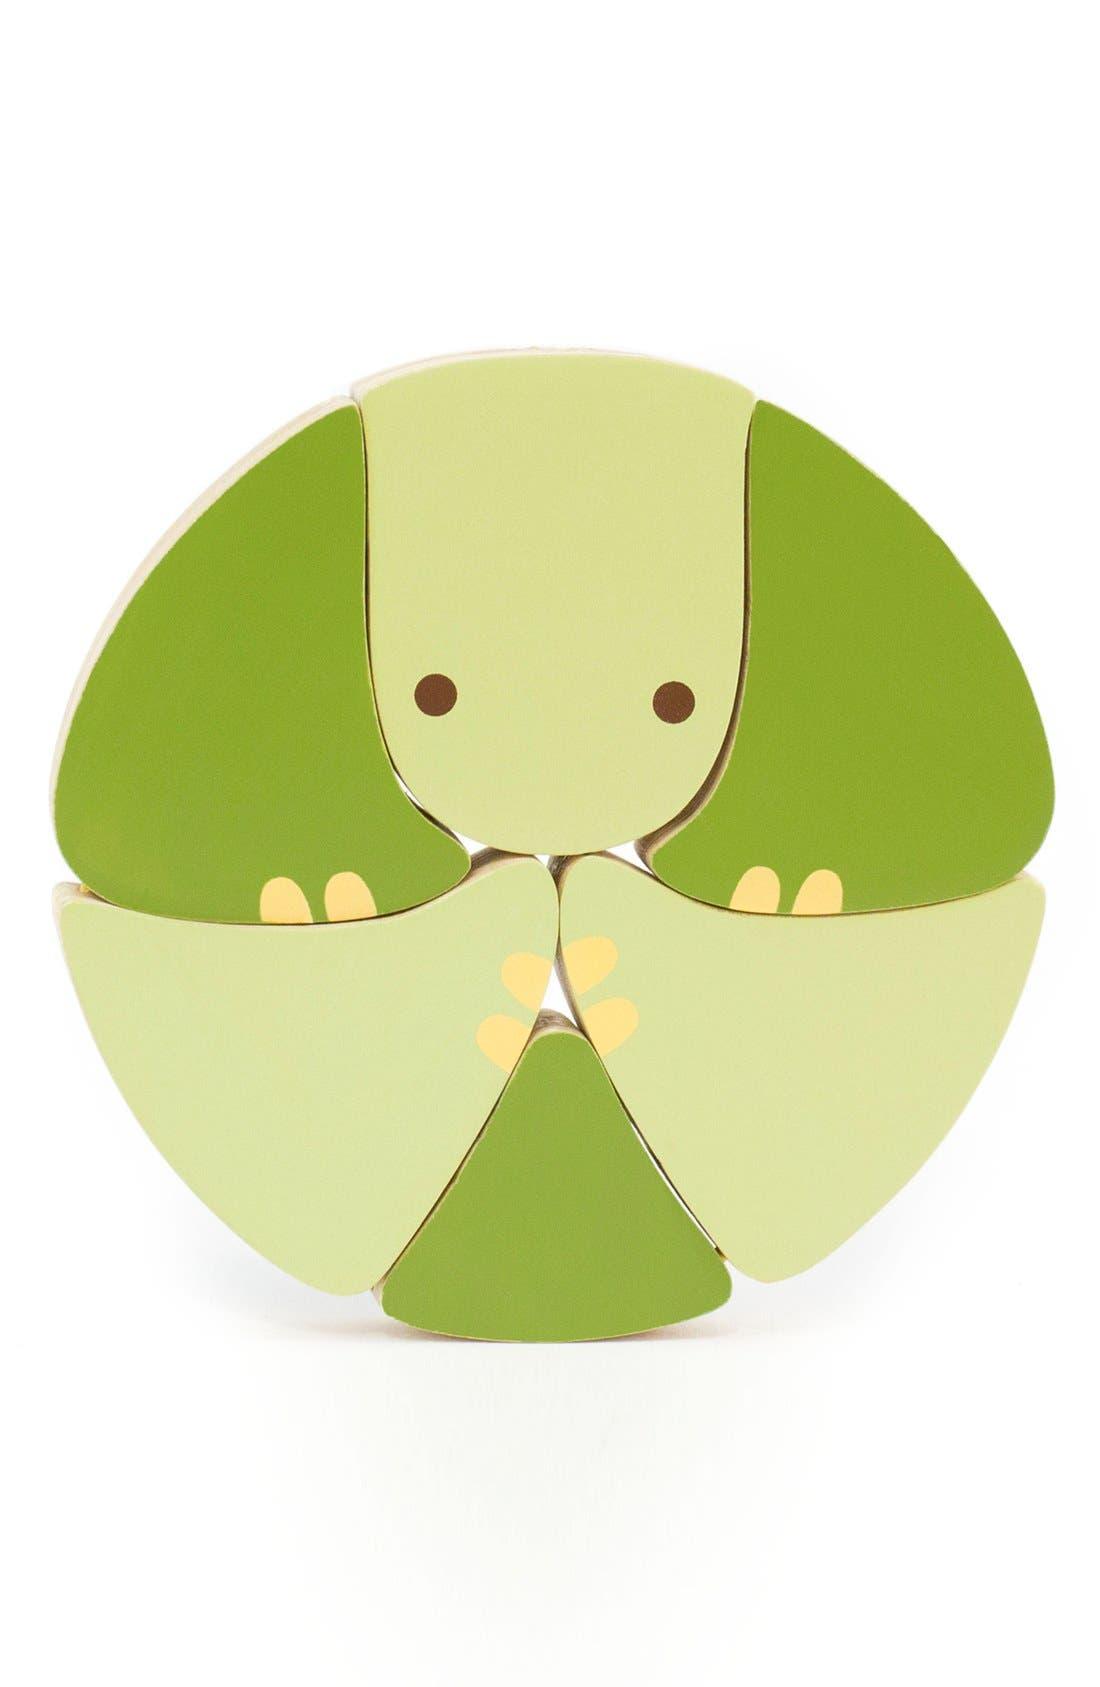 Main Image - Skip Hop 'Giraffe Safari - Flip & Play Turtle' Wooden Toy